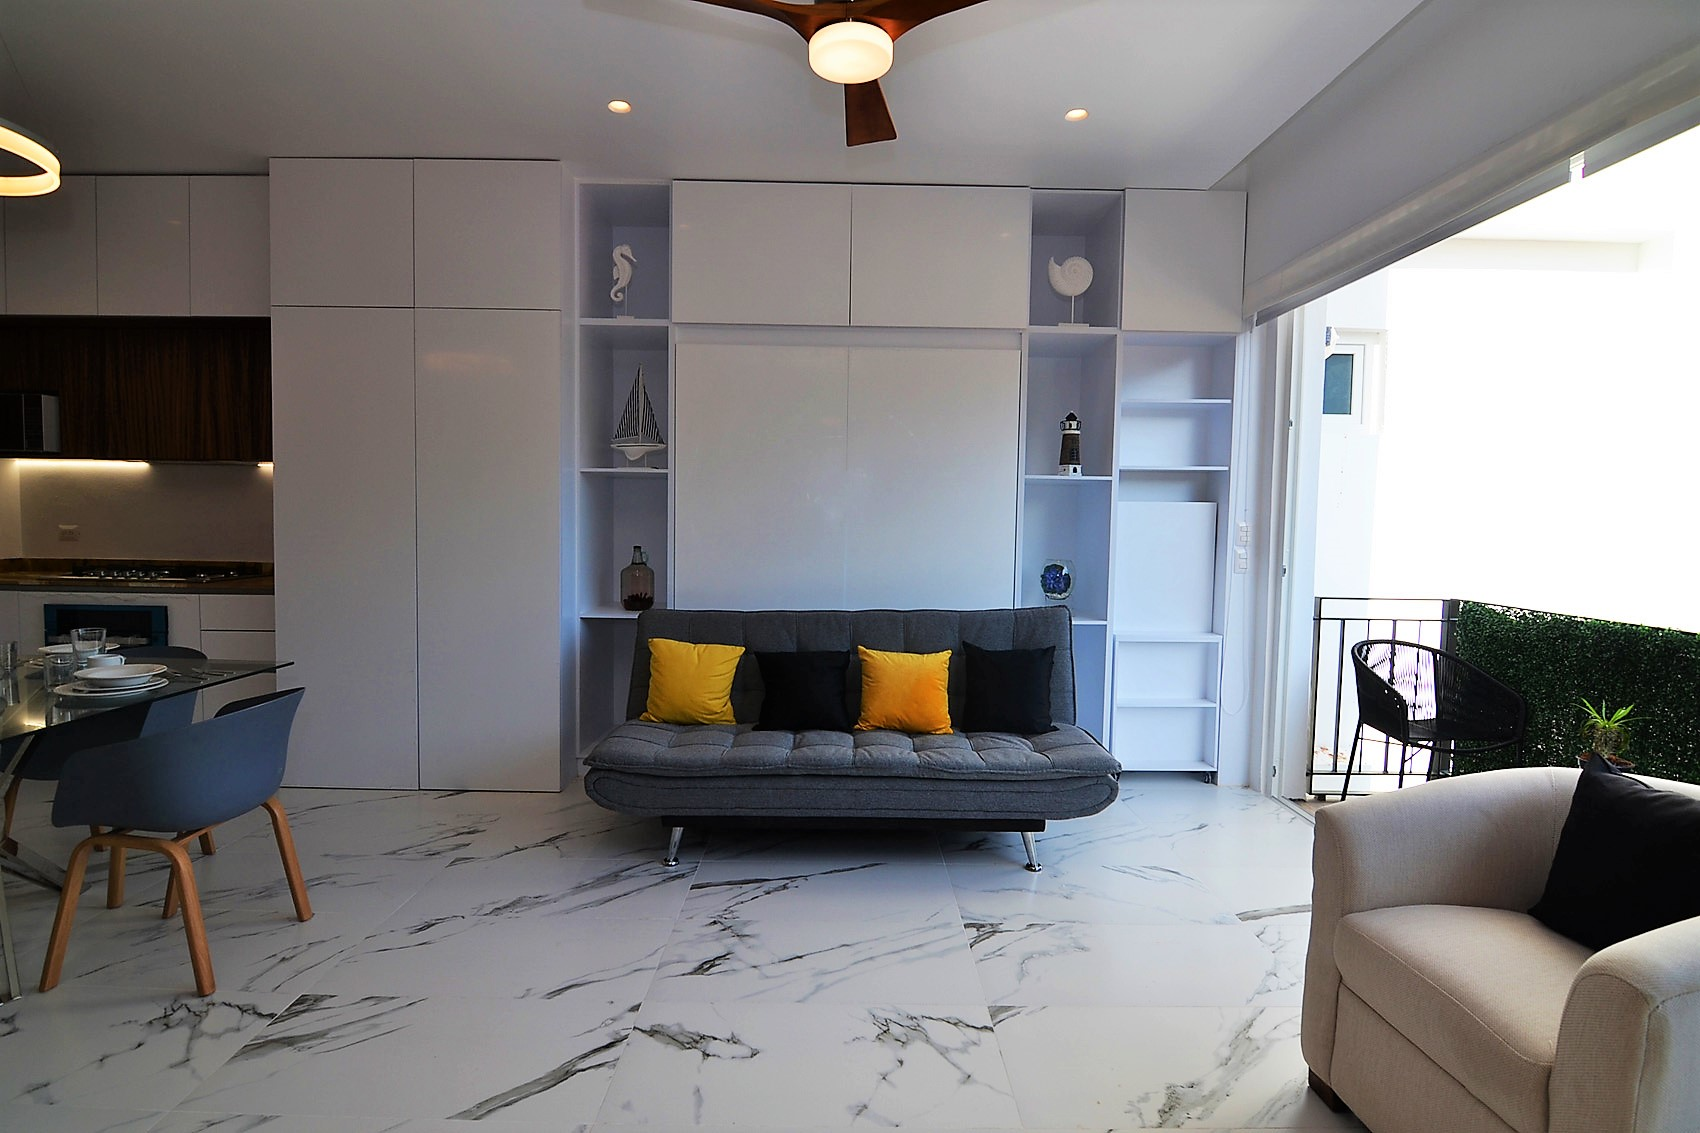 Condo Avida Super Studio 4 - Puerto Vallarta Furnished Condo Romantic Zone (48)